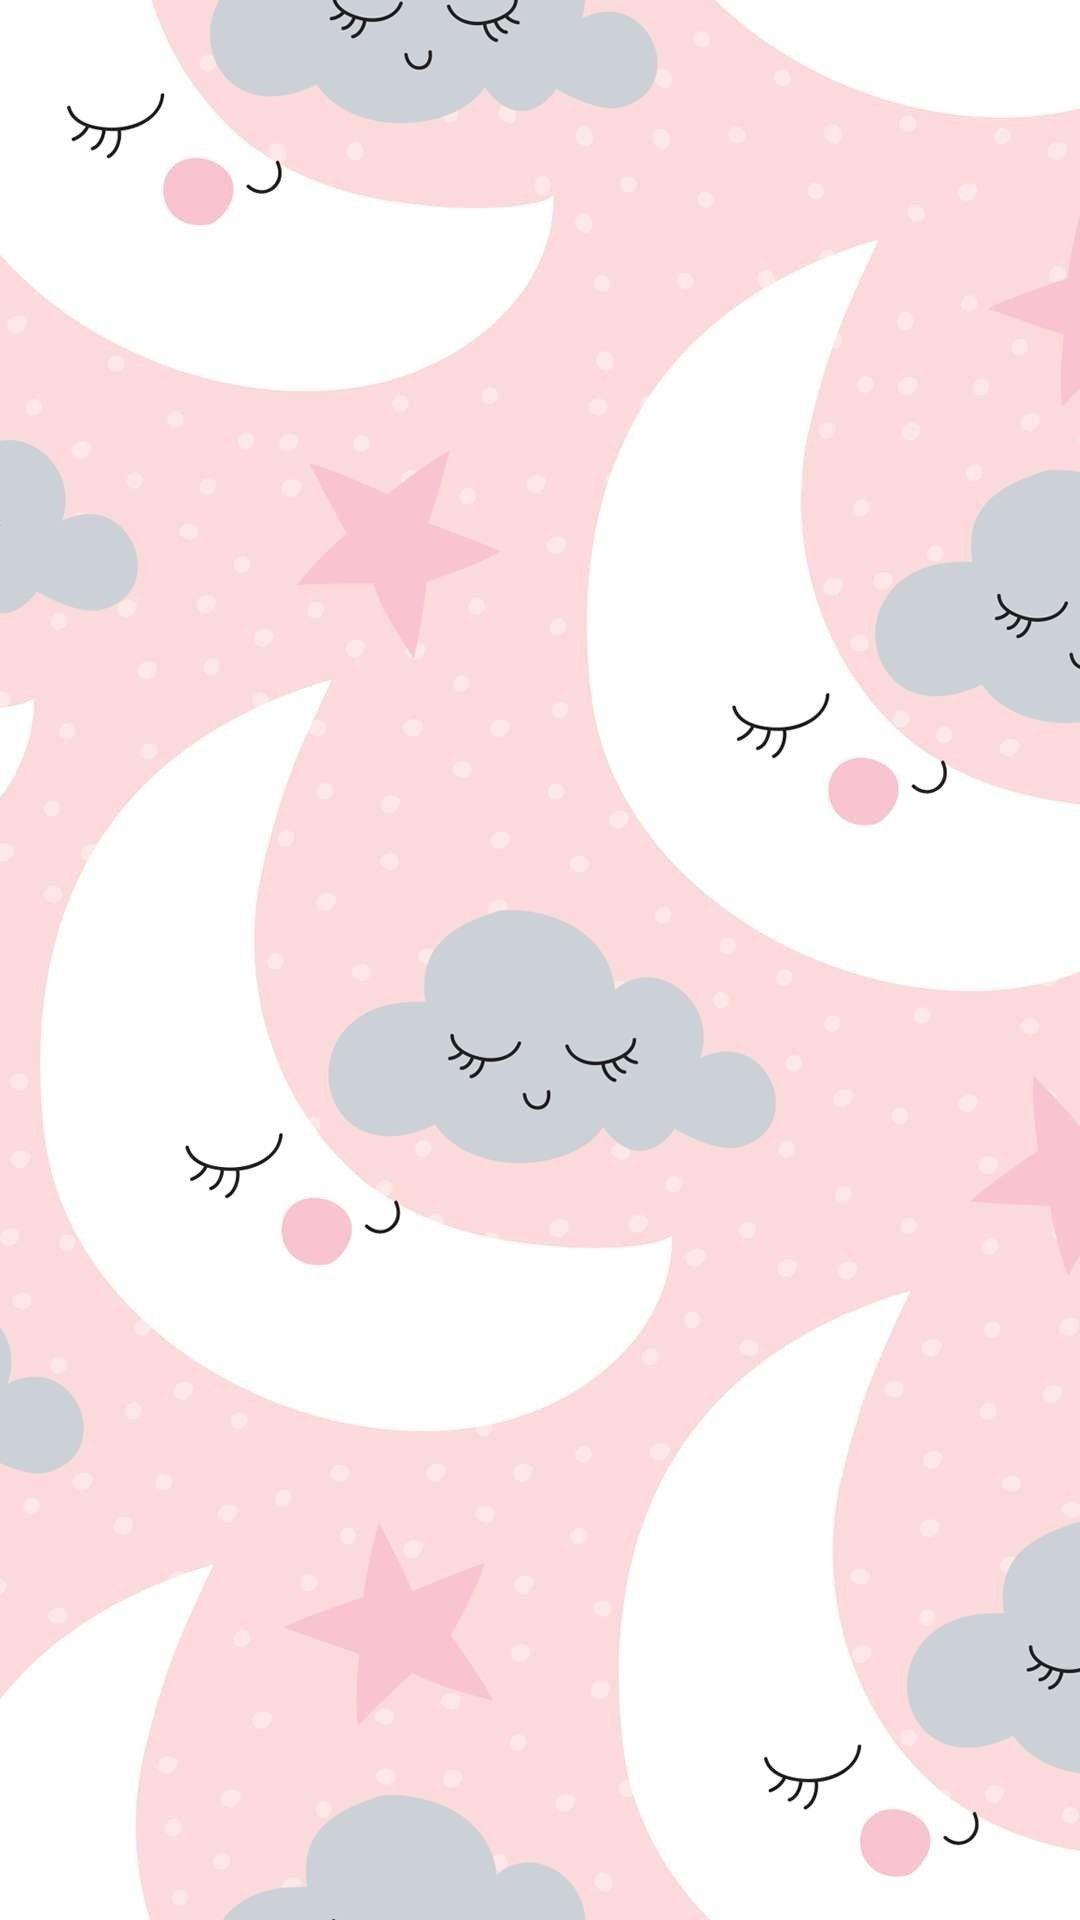 Res: 1080x1920, A lua e a nuvem.